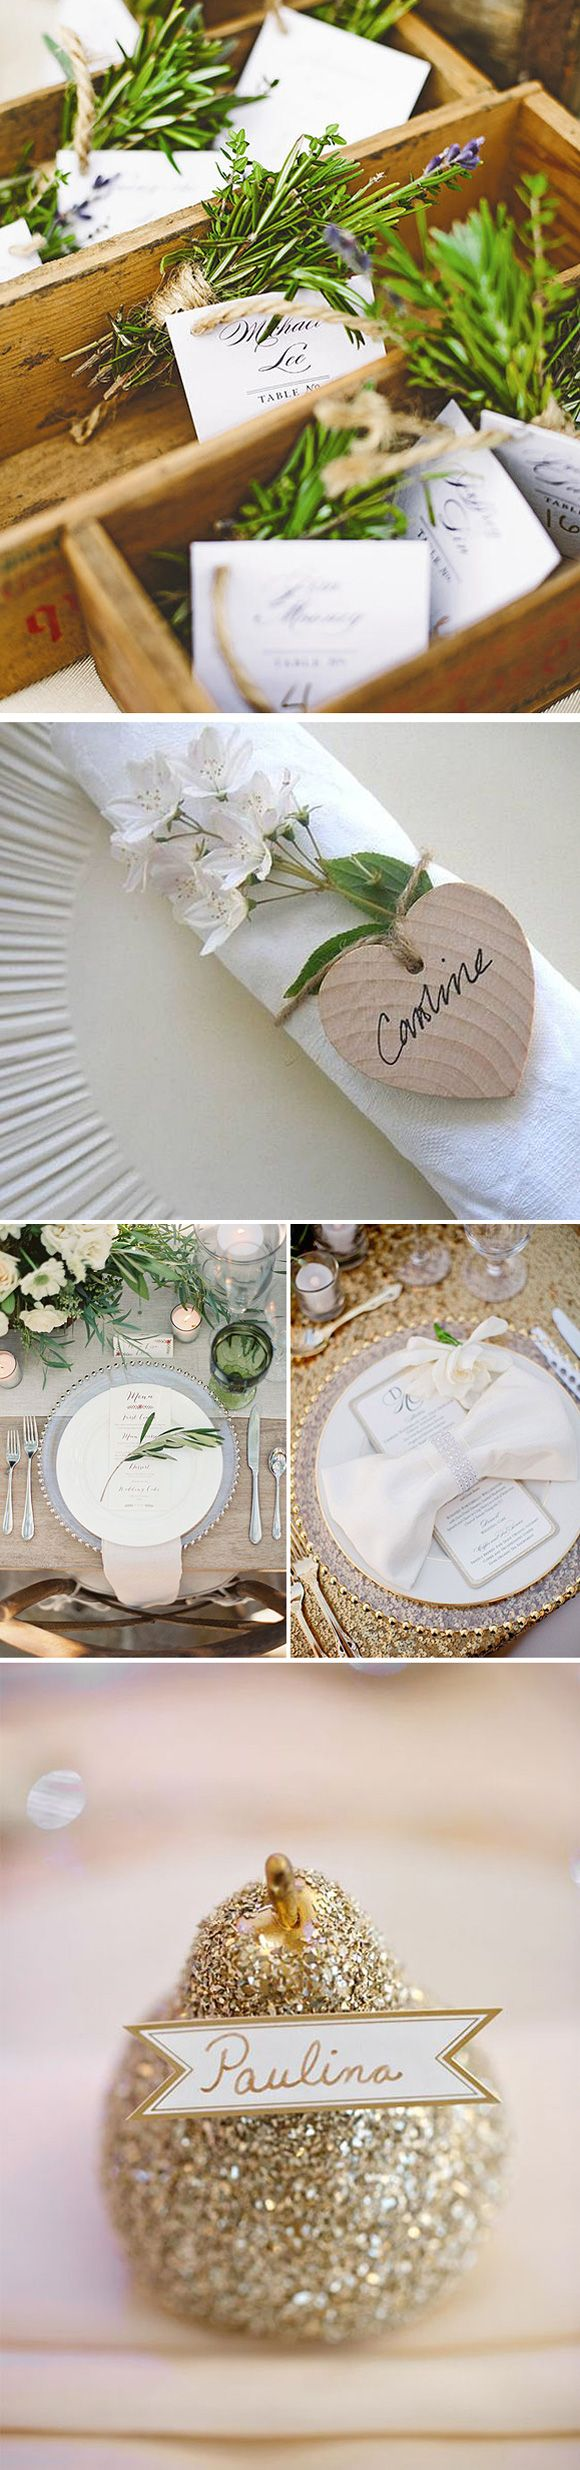 Ideas decoracion platos invitados boda 580 2470 - Ideas decoracion bodas ...